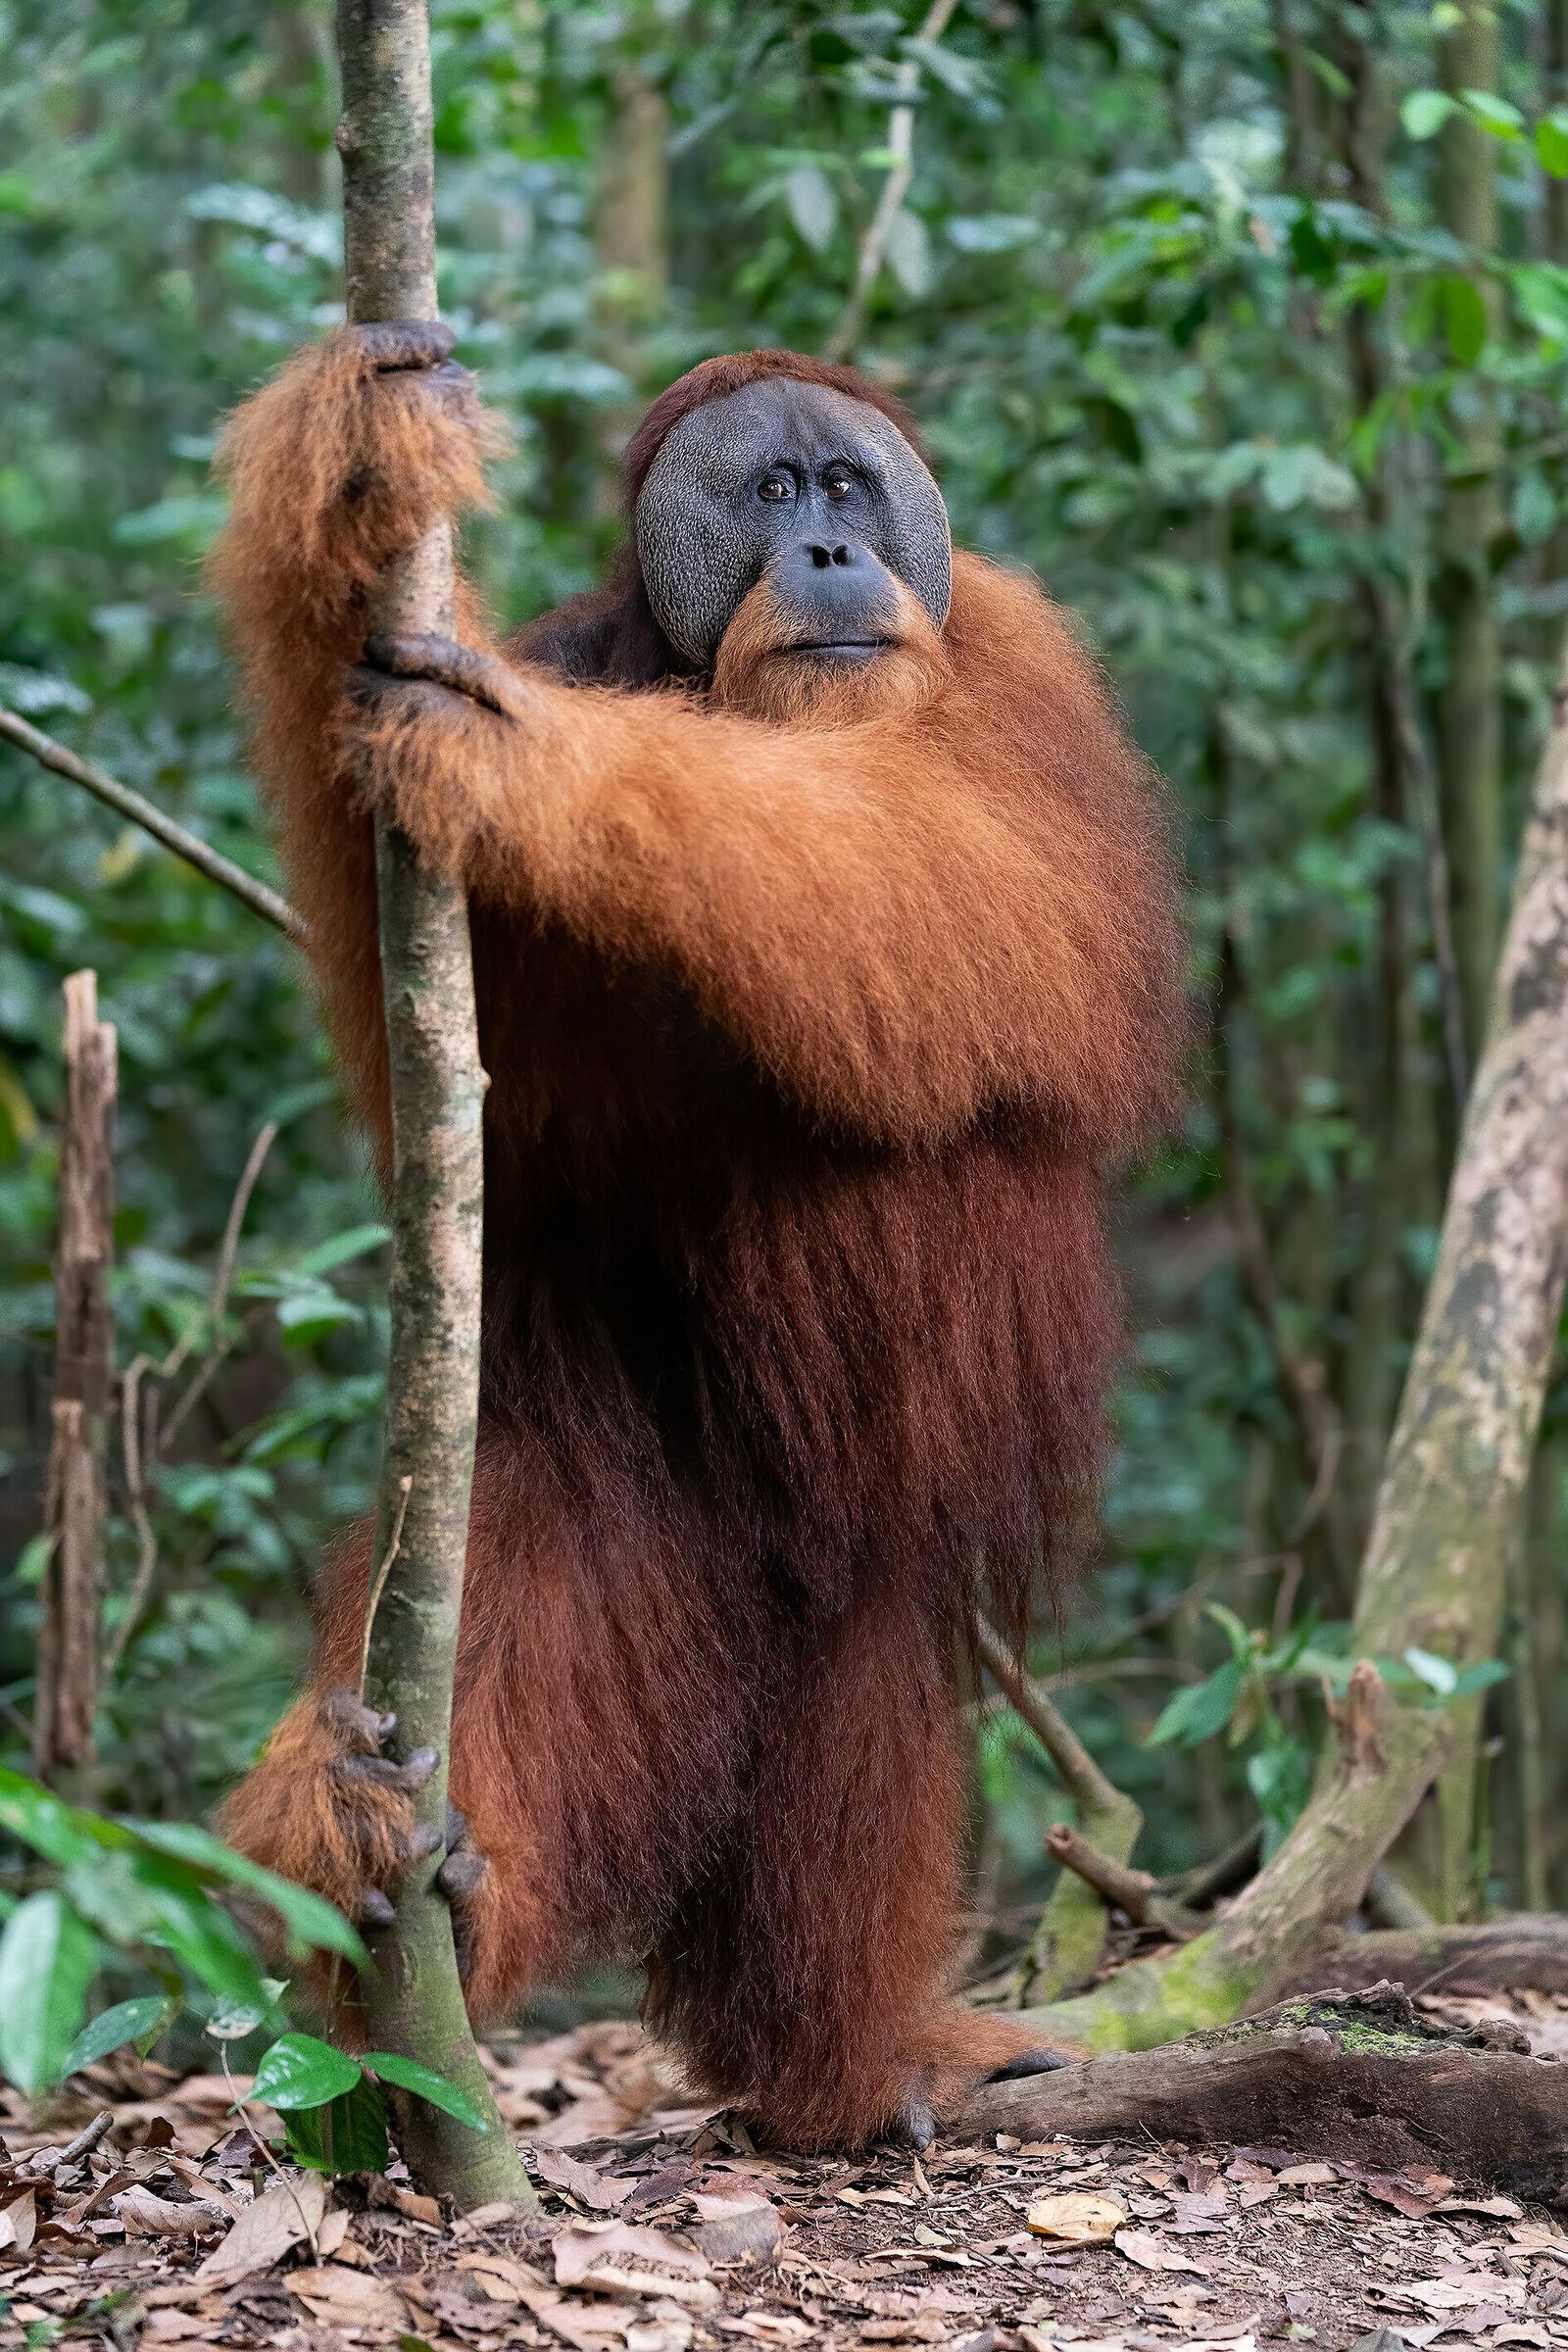 Jungle's guardian...